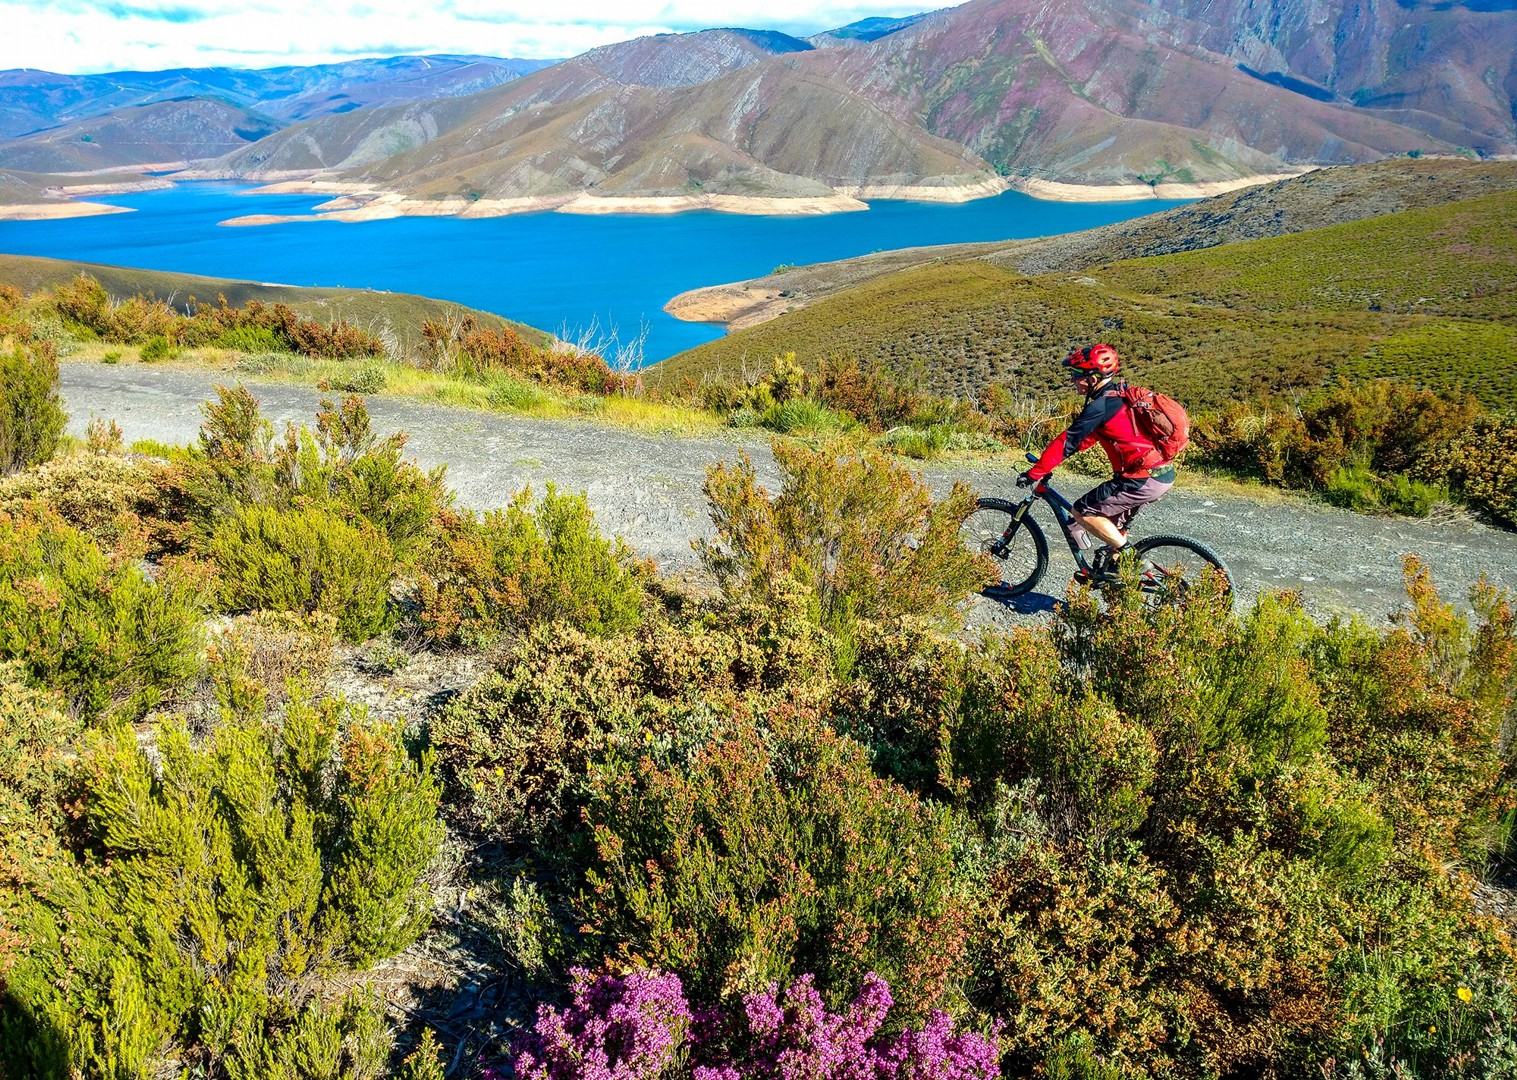 IMG_20170518_101735841.jpg - Spain - Ruta de la Plata - Guided Mountain Bike Holiday - Mountain Biking